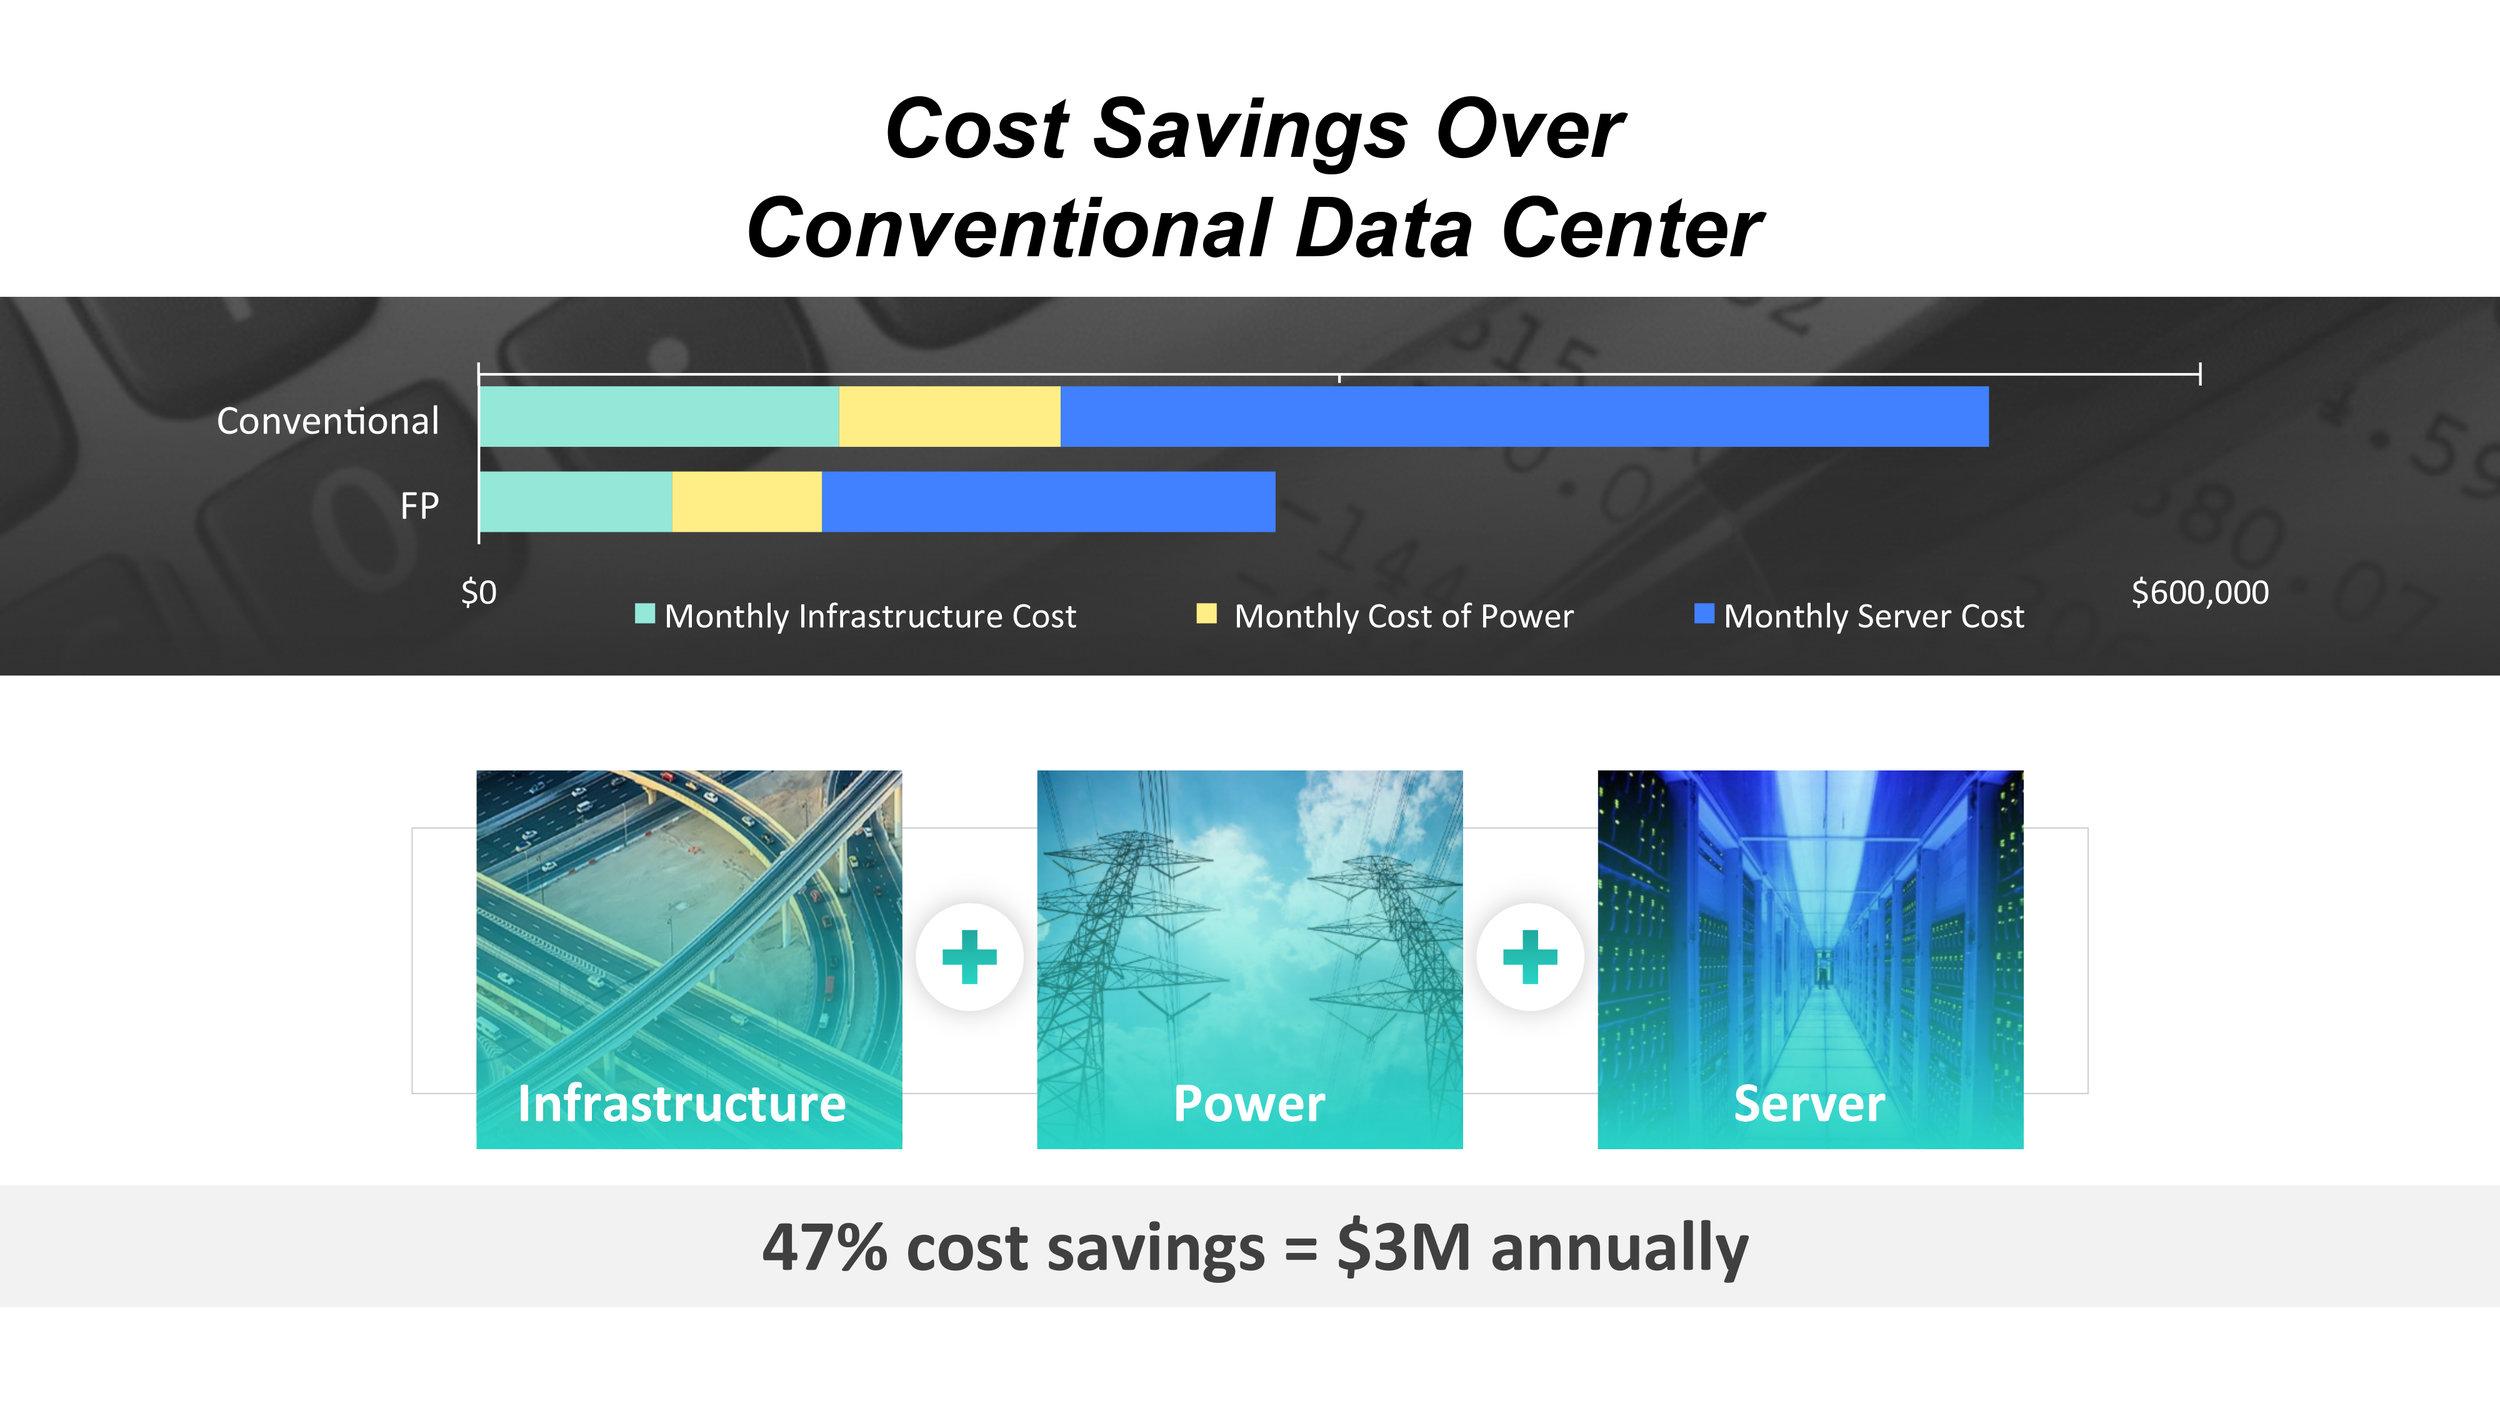 conventional data center no border.jpg